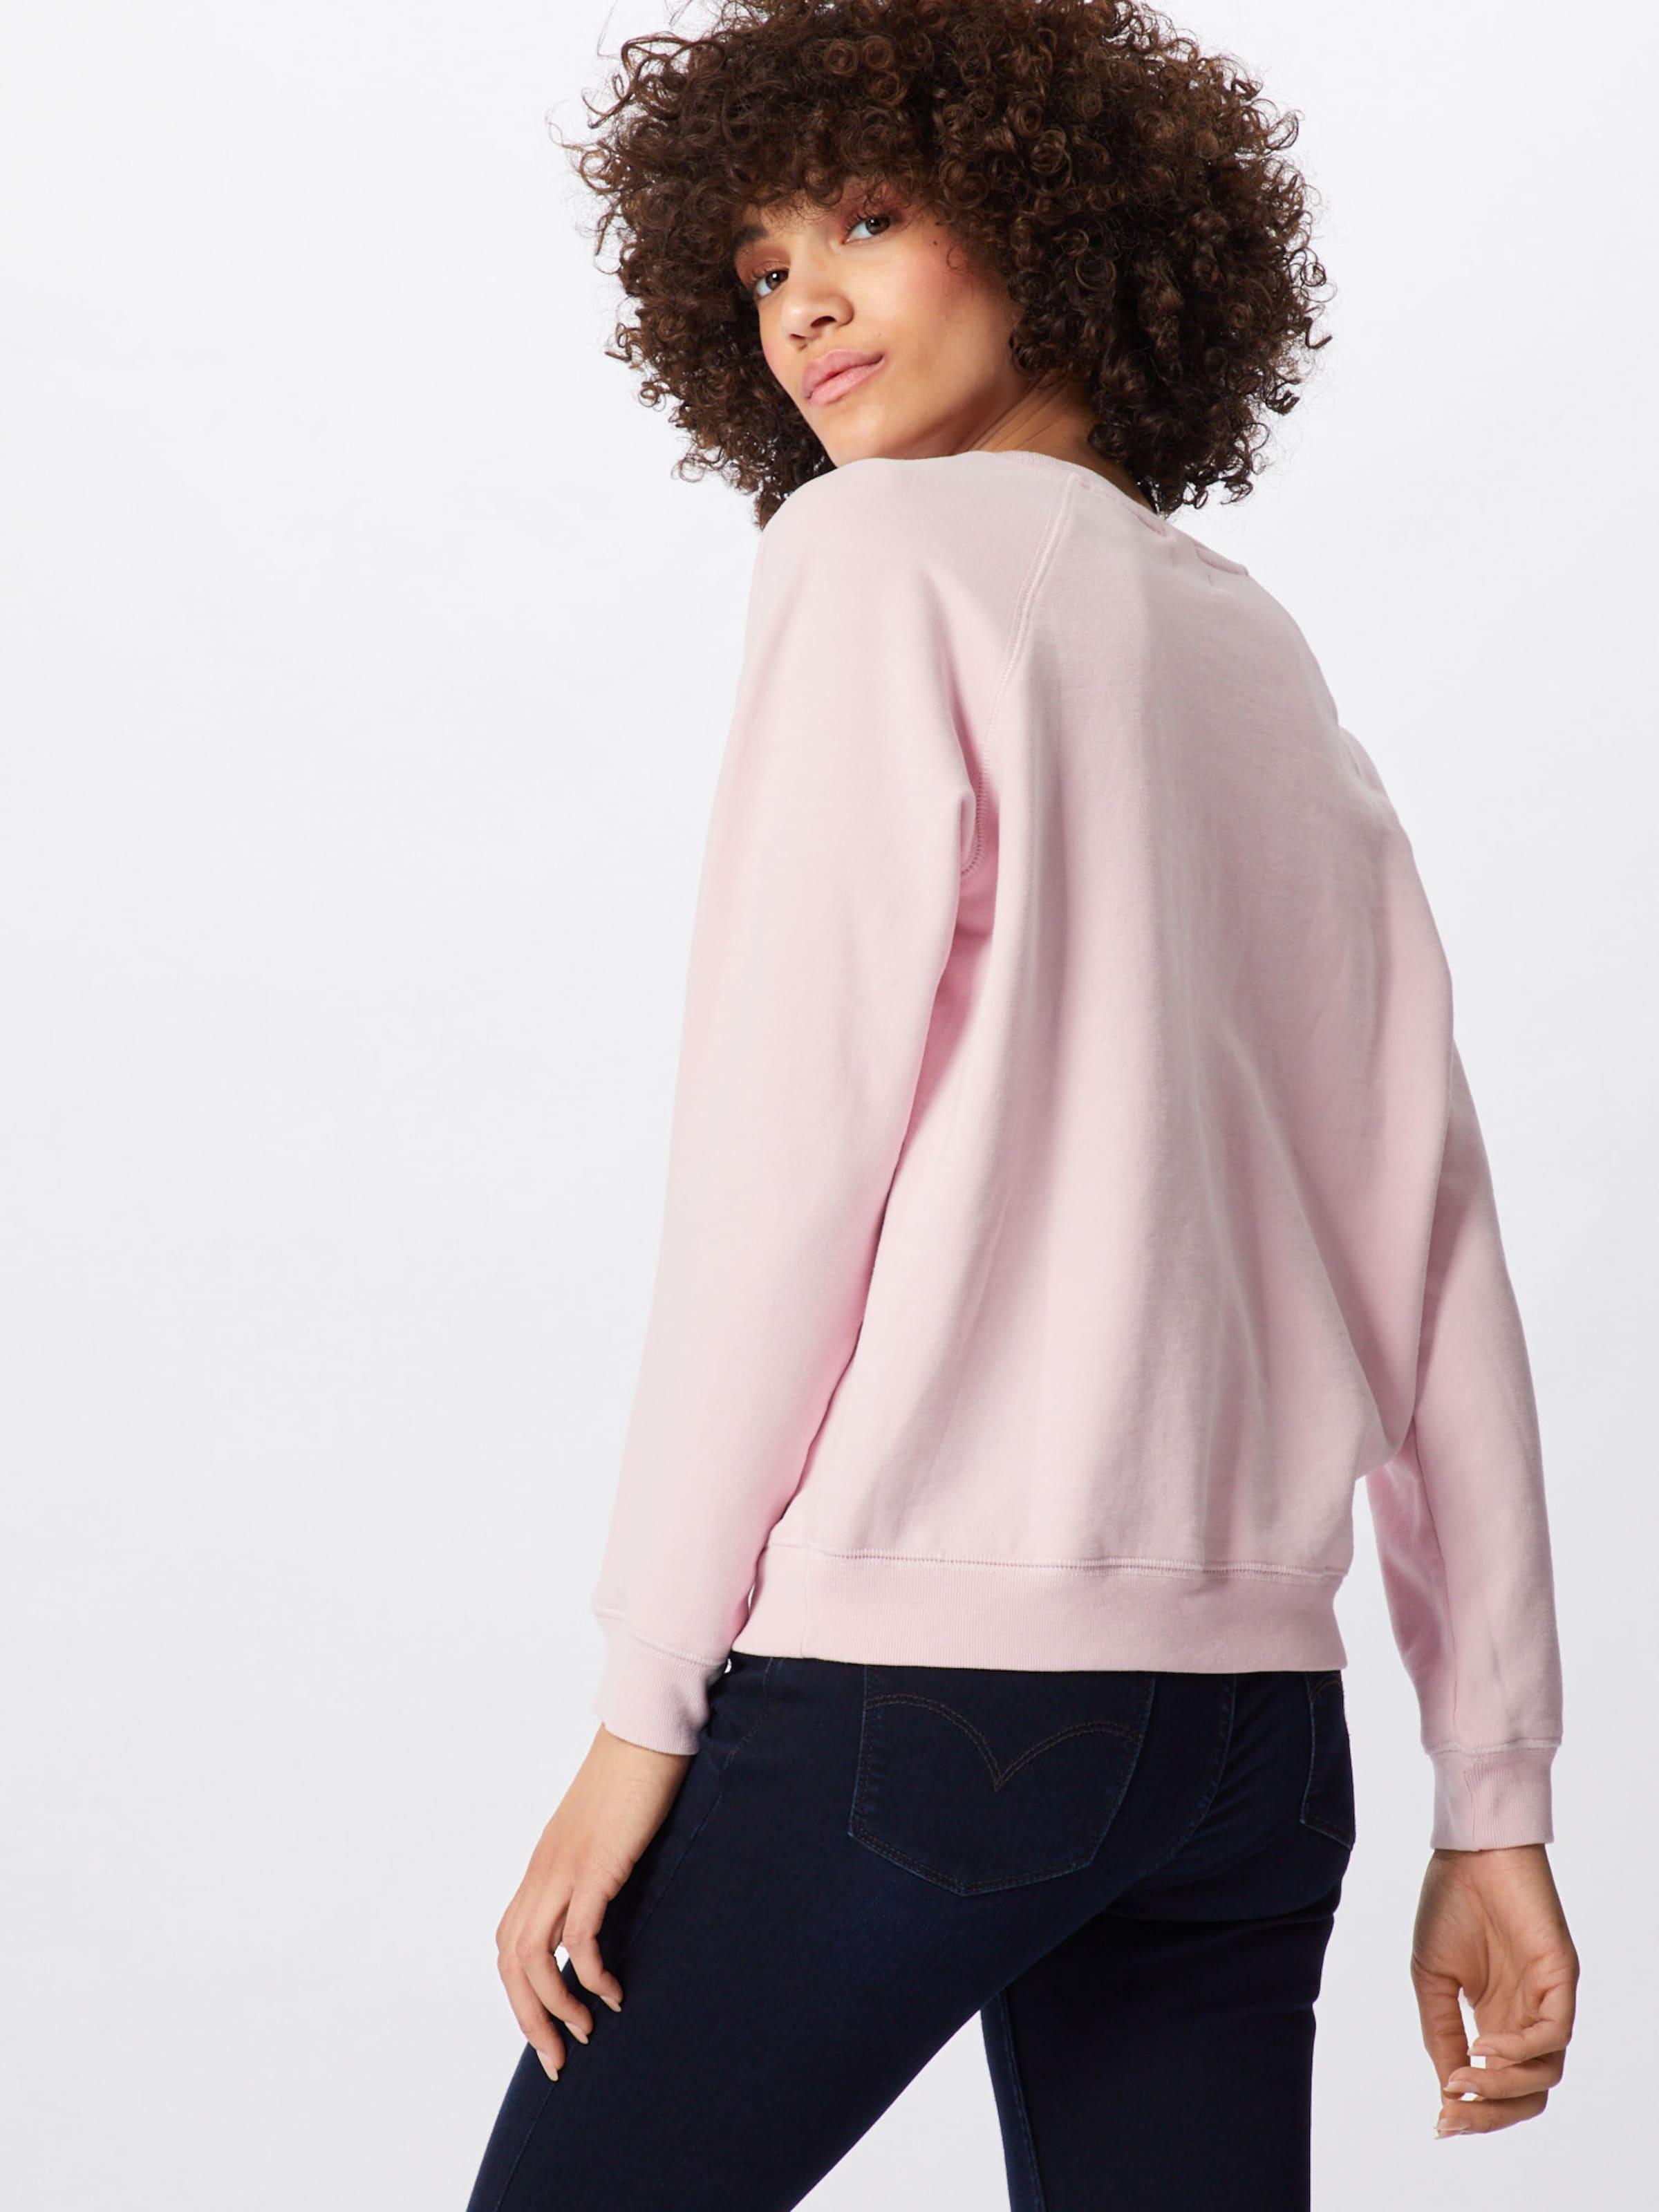 Levi's Rose Sweat shirt shirt Rose Levi's Sweat En En qGVSUzLMjp